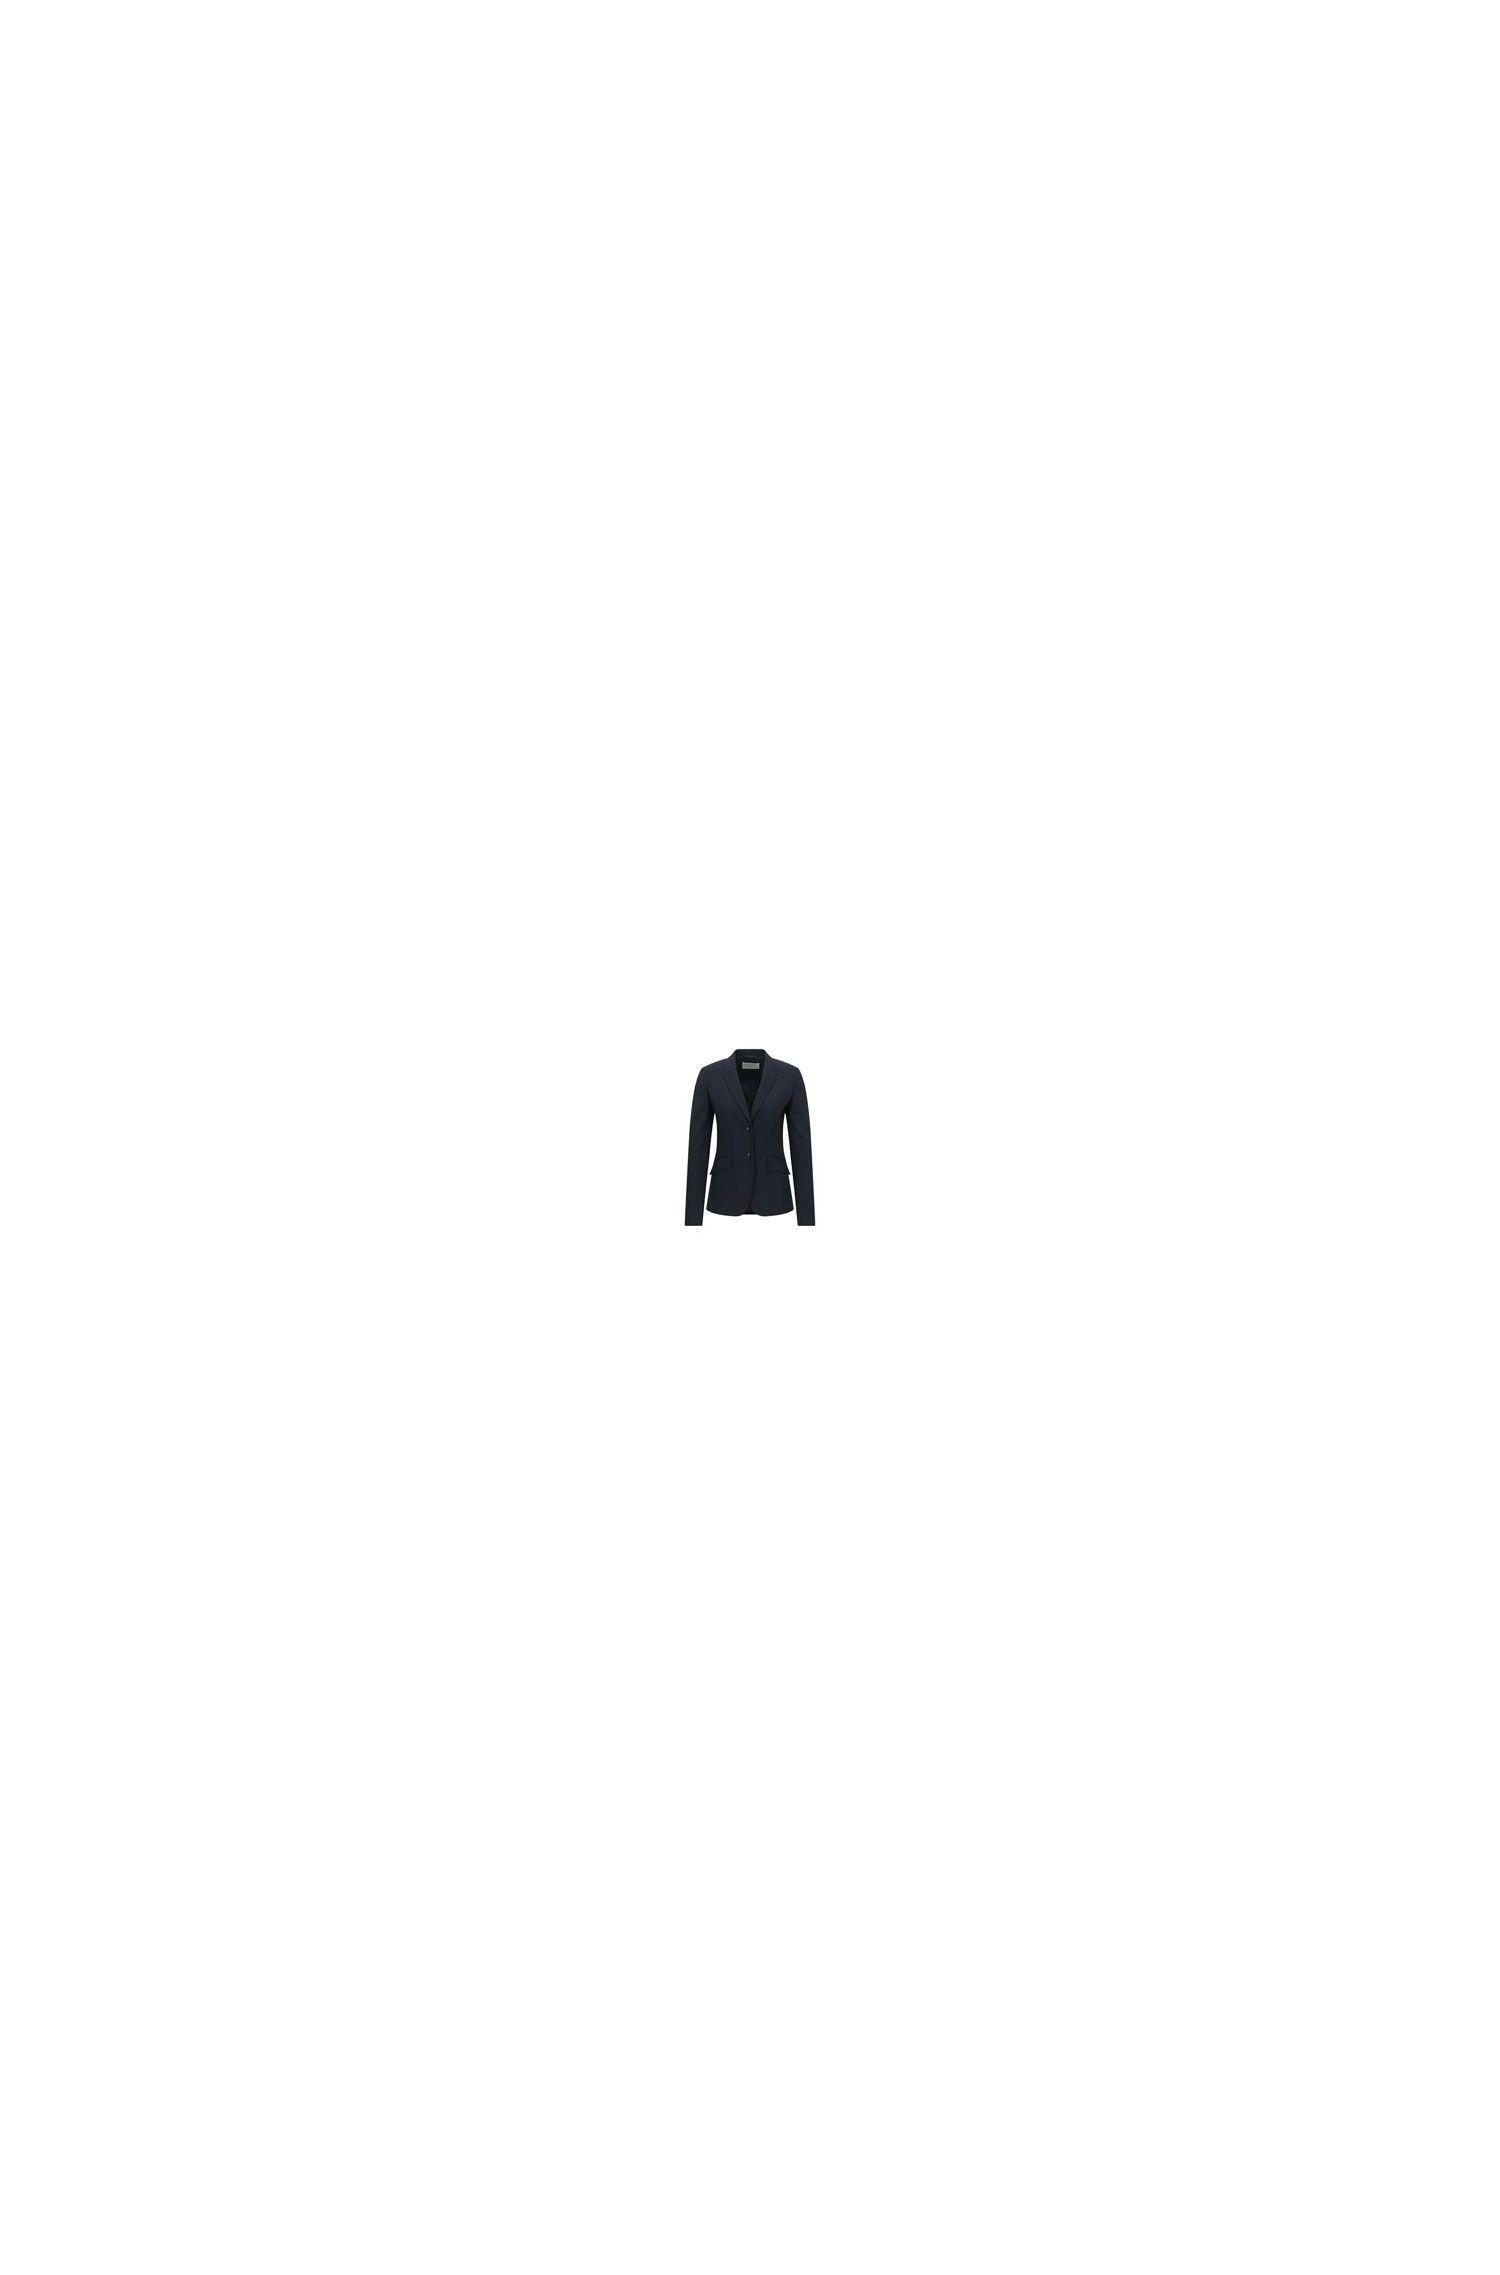 Stretch wool blazer with peak lapels